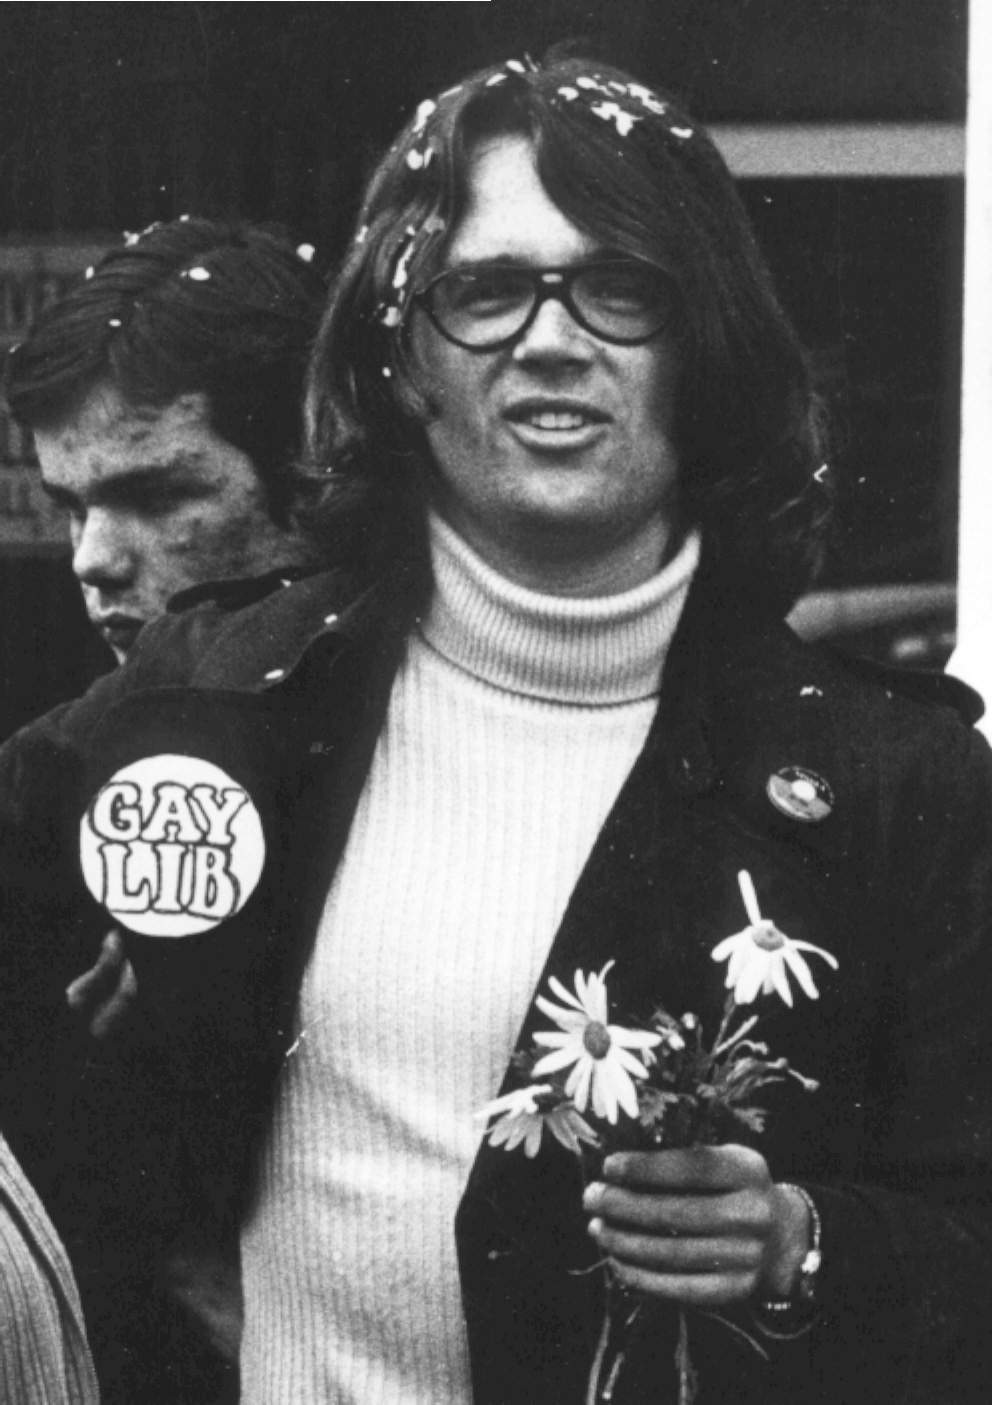 1972 - Sydney, Australia